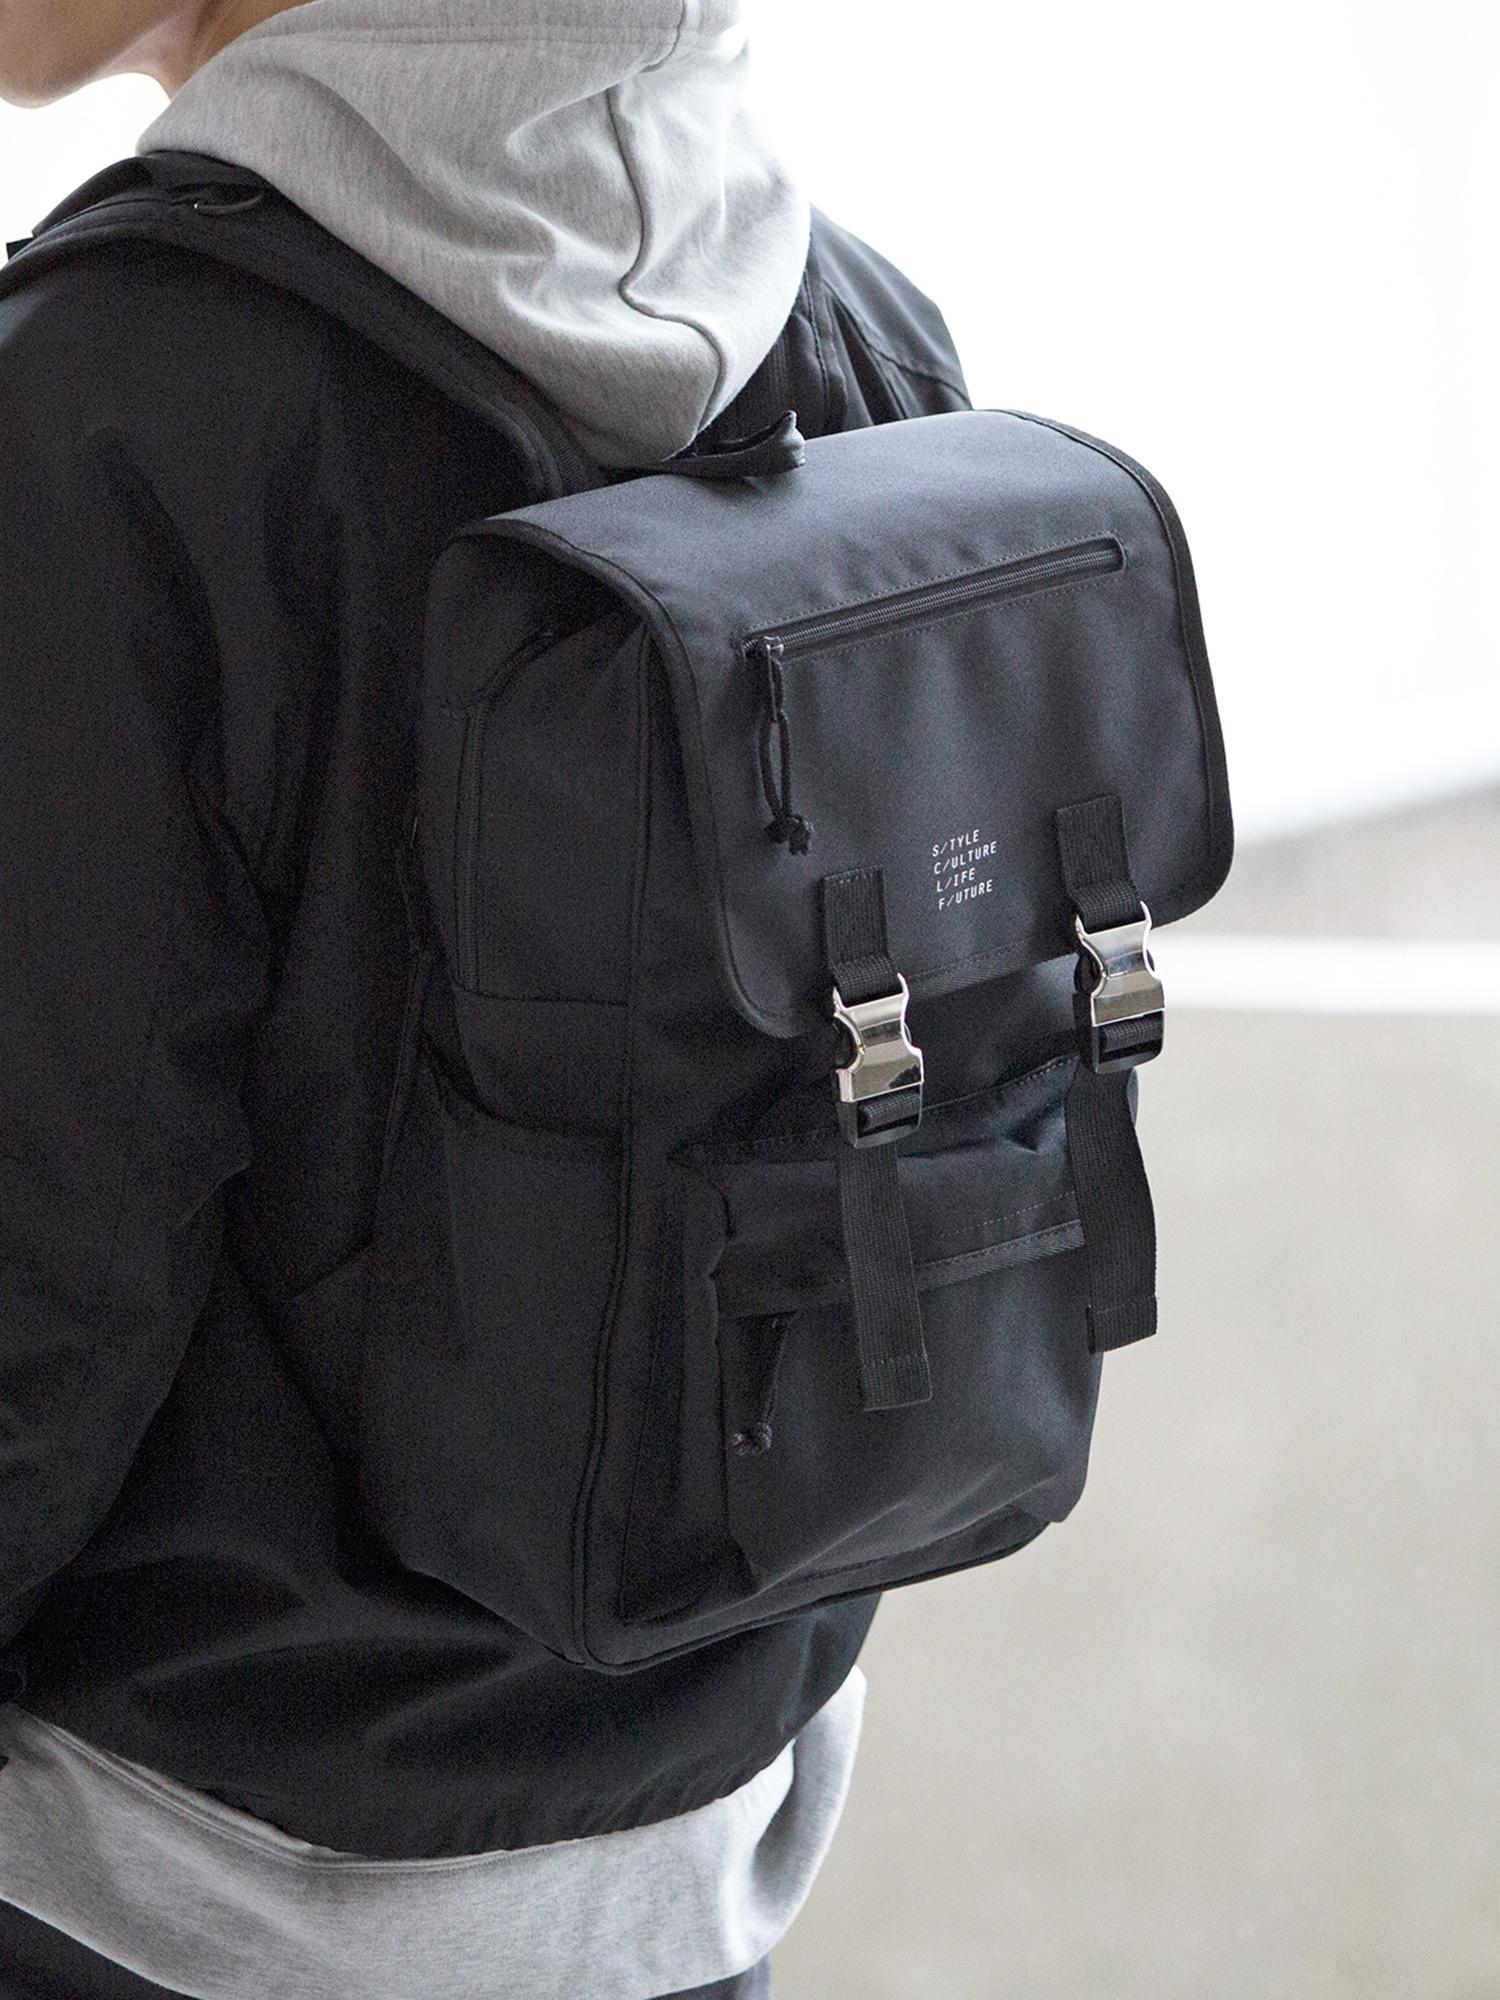 WEGO/フラップメタルバックパック